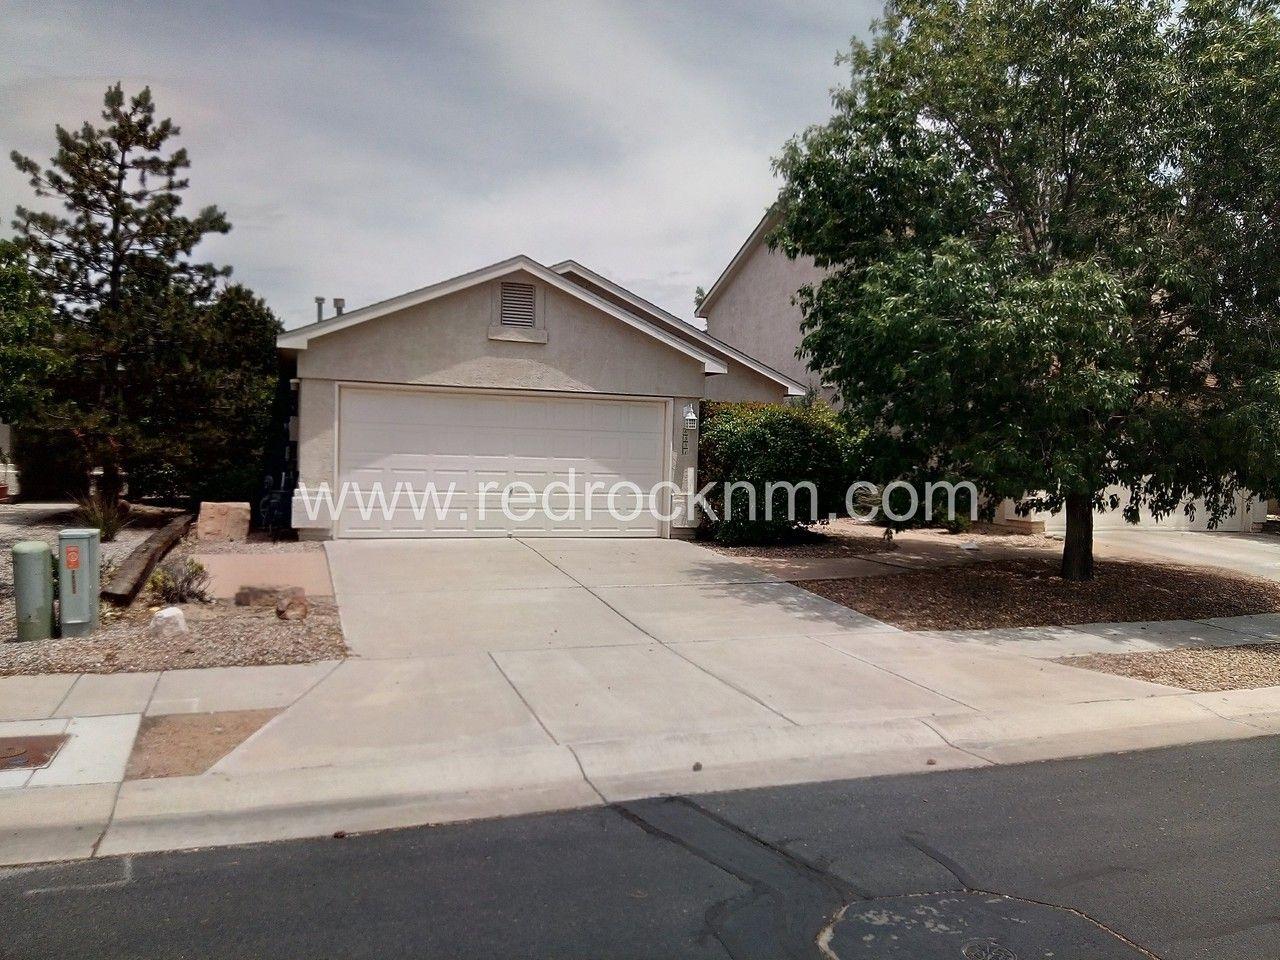 6331 Michelangelo Ln Nw Albuquerque Nm 87114 3 Bedroom